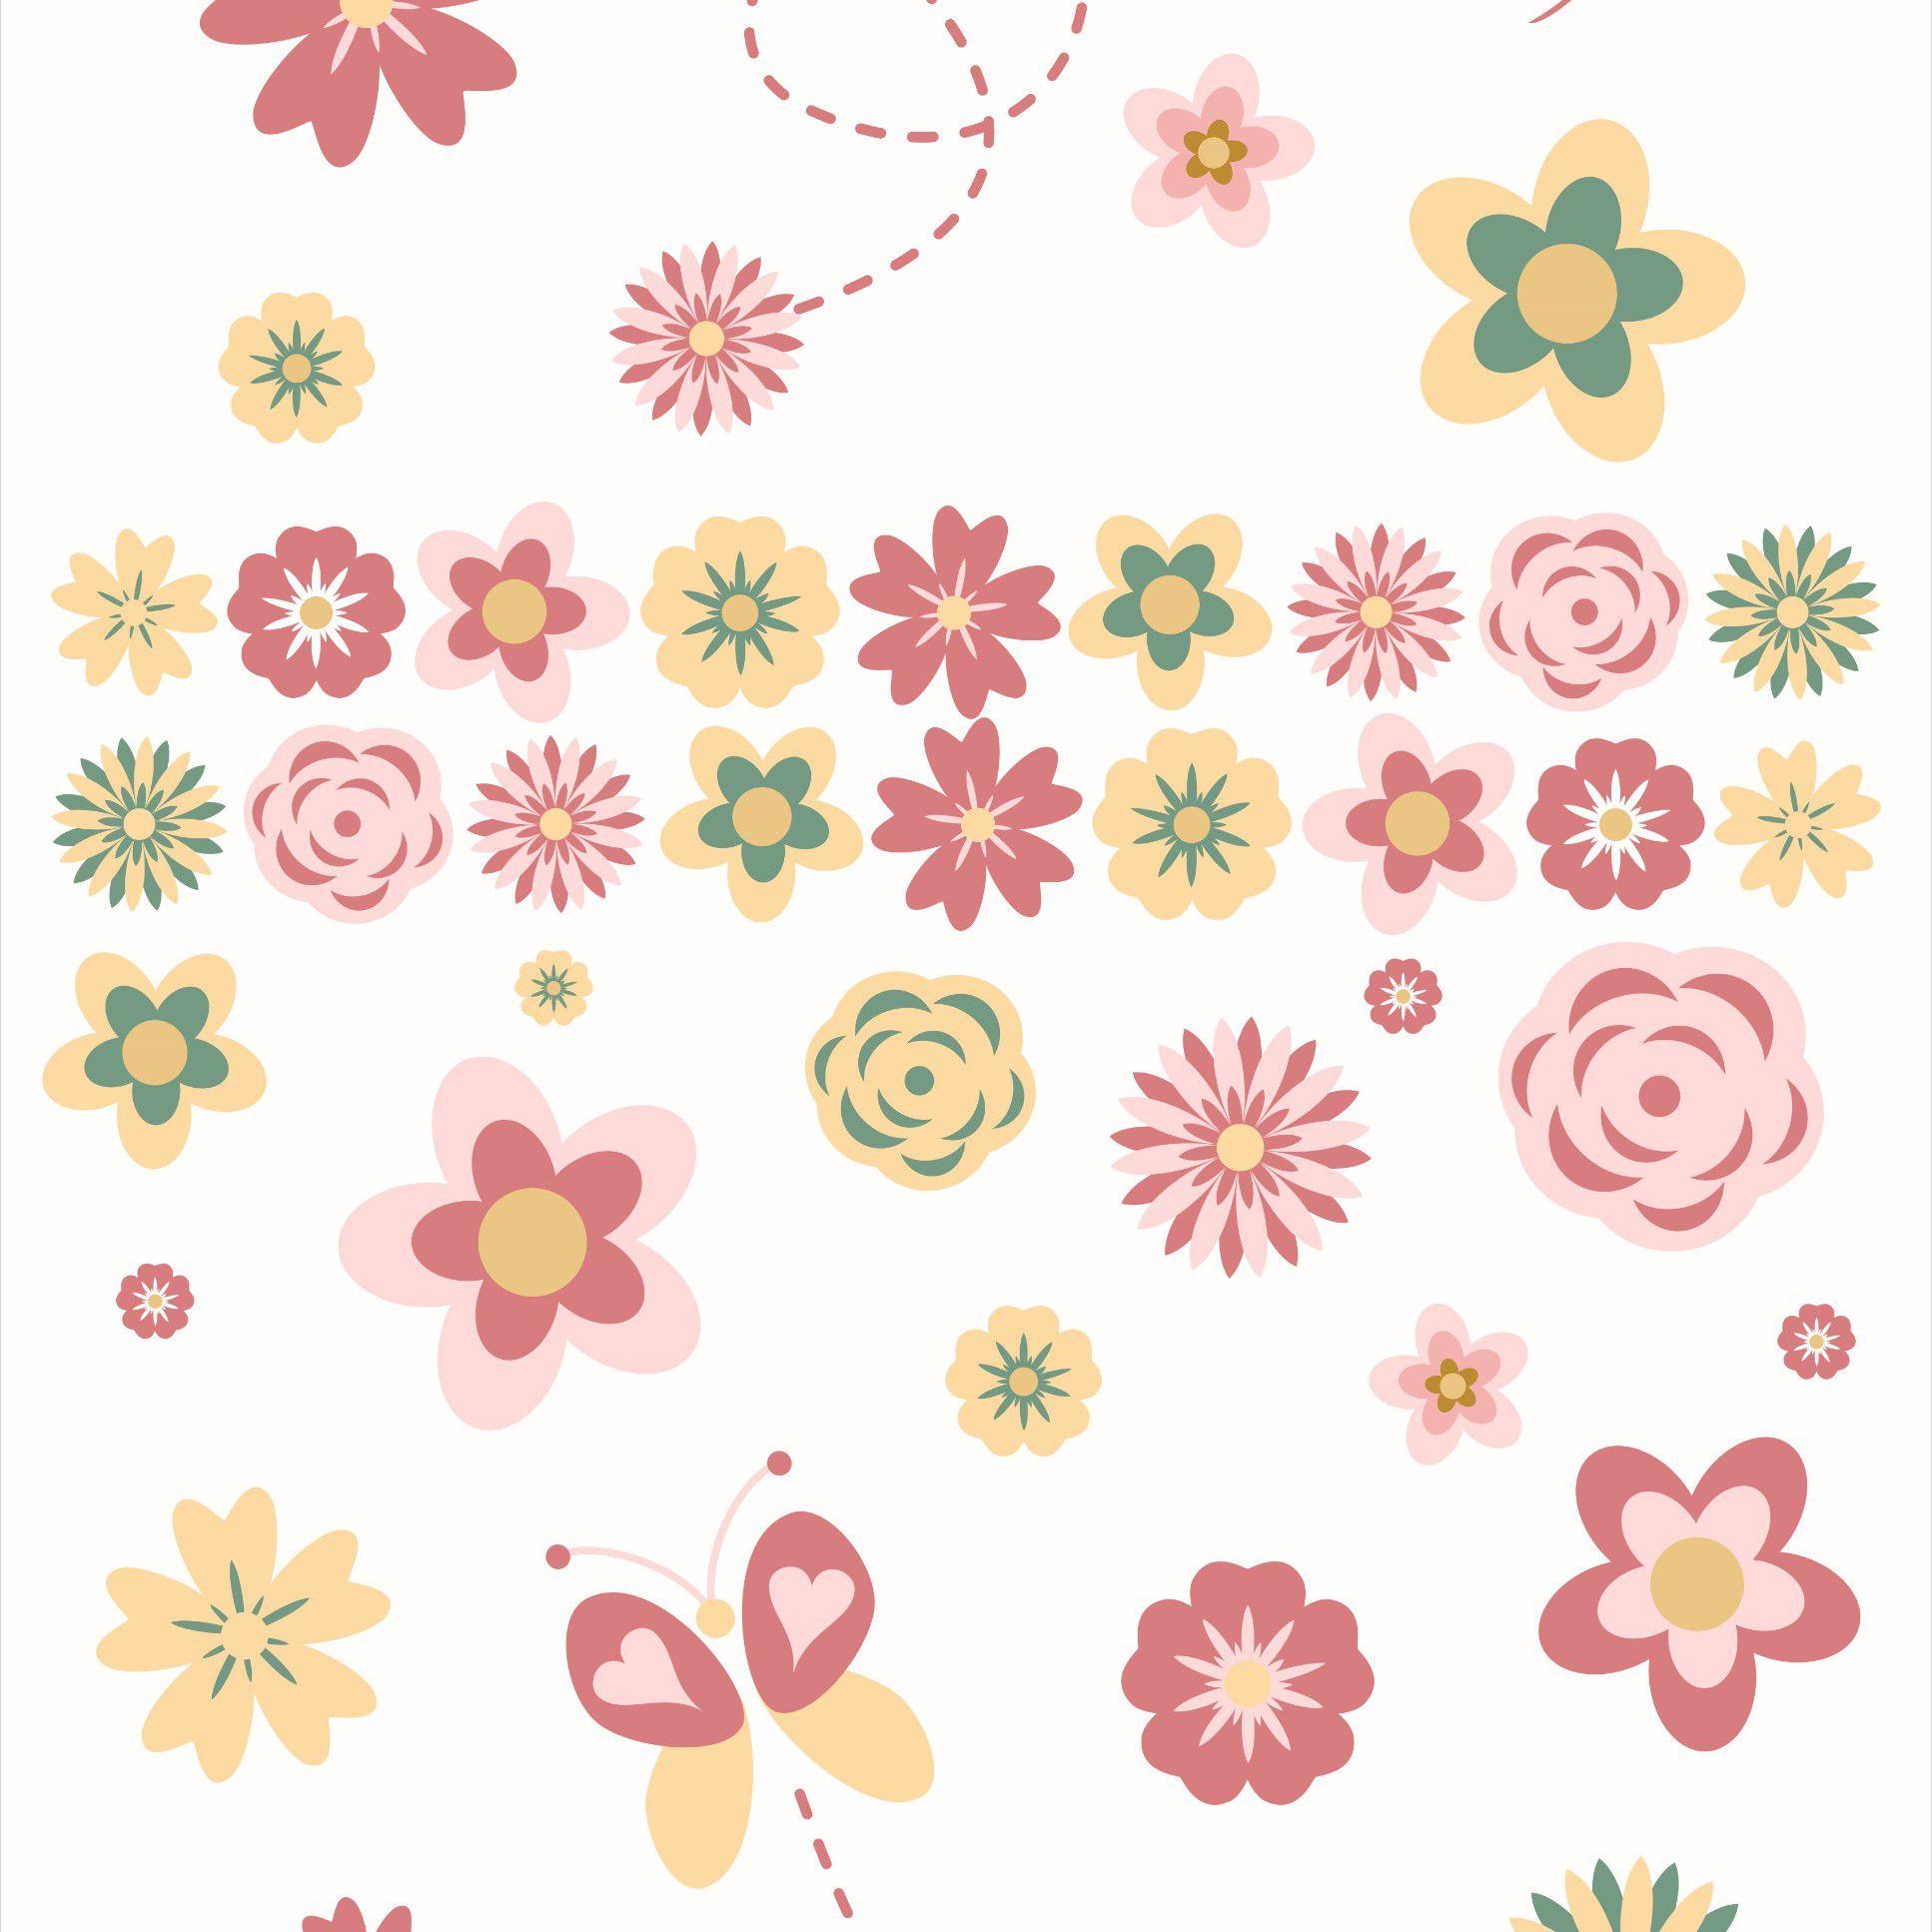 Papel de Parede Adesivo Lavável  Floral CO-207 Cole Aí